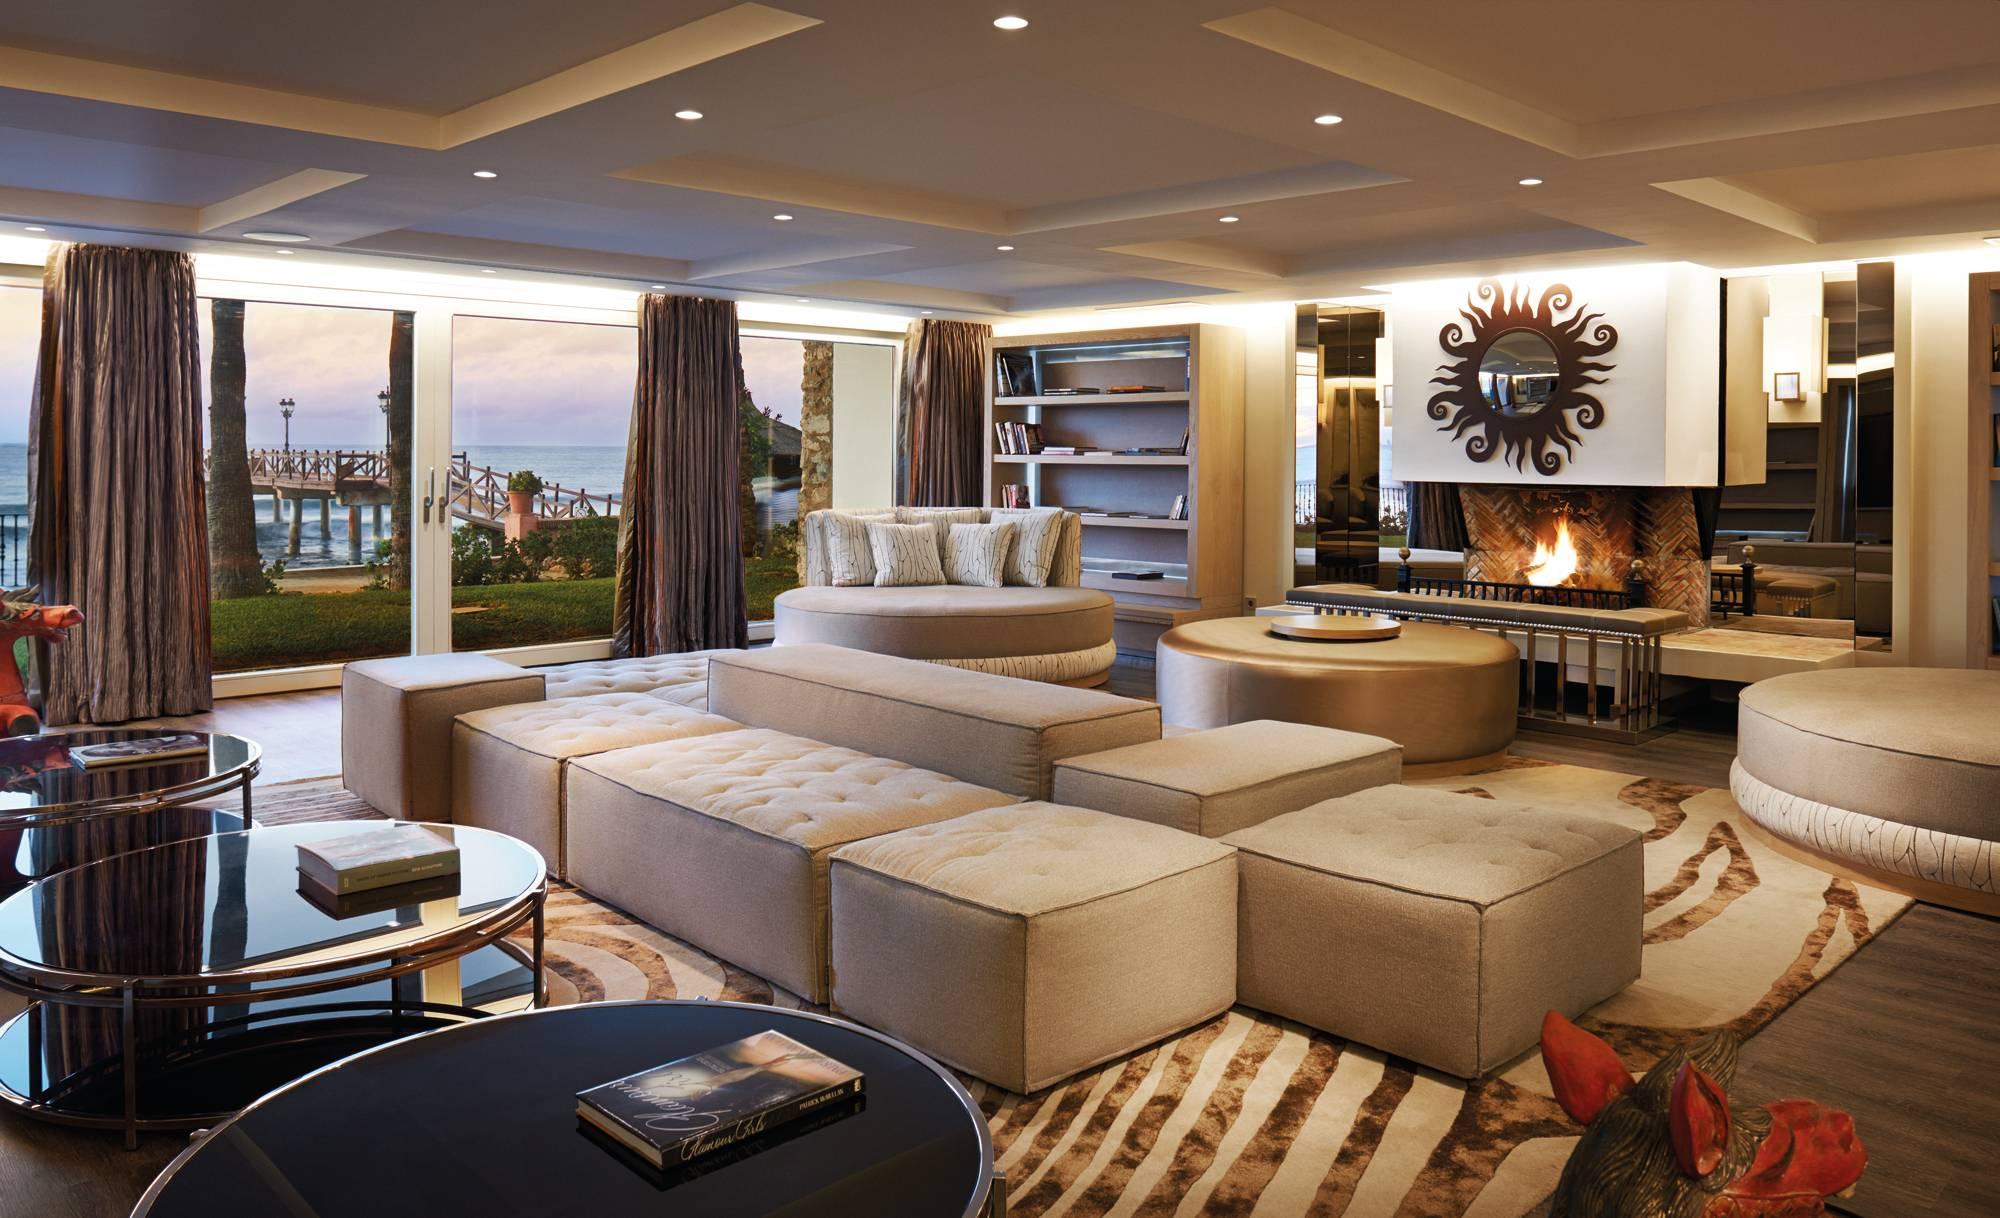 Villa Del Mar The Ultimate Luxury Stay In Marbella Hashtag Spain